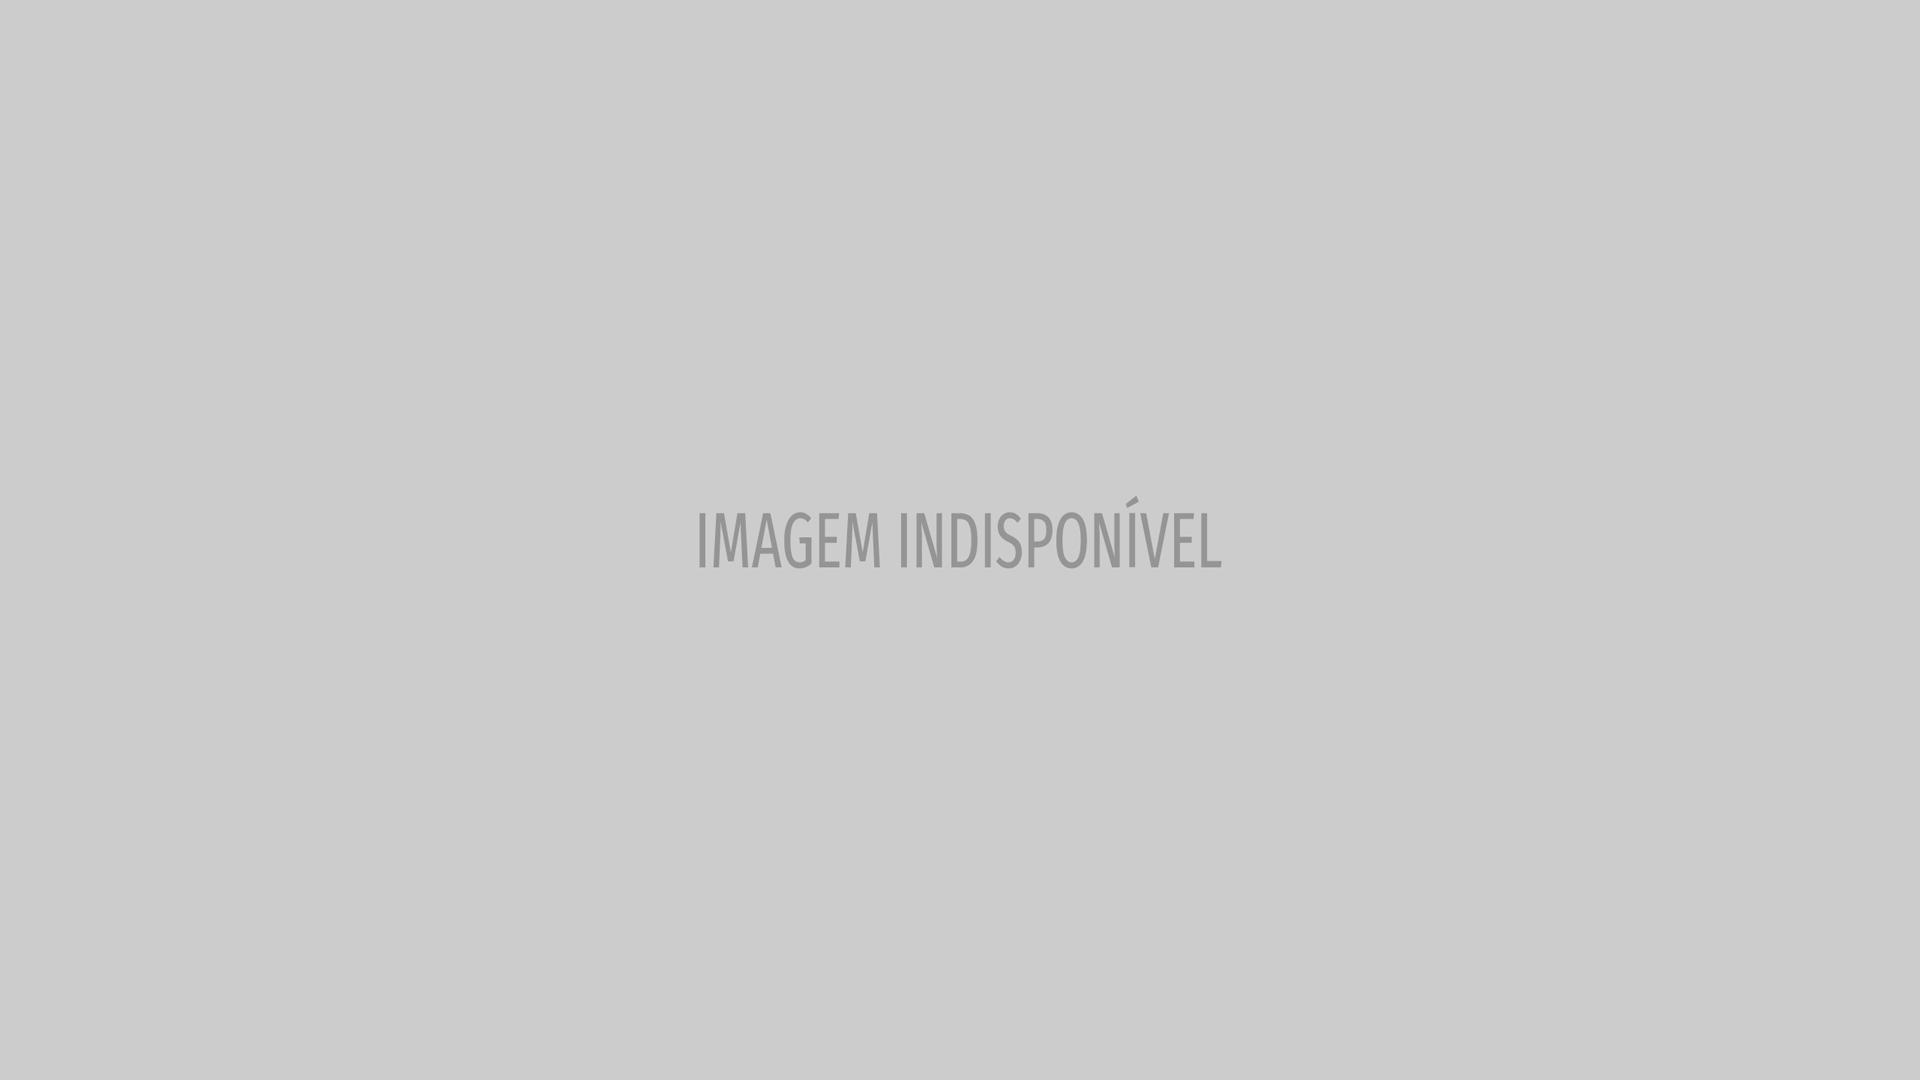 Em encontro com Moro, Freixo alfineta Flavio Bolsonaro; vídeo